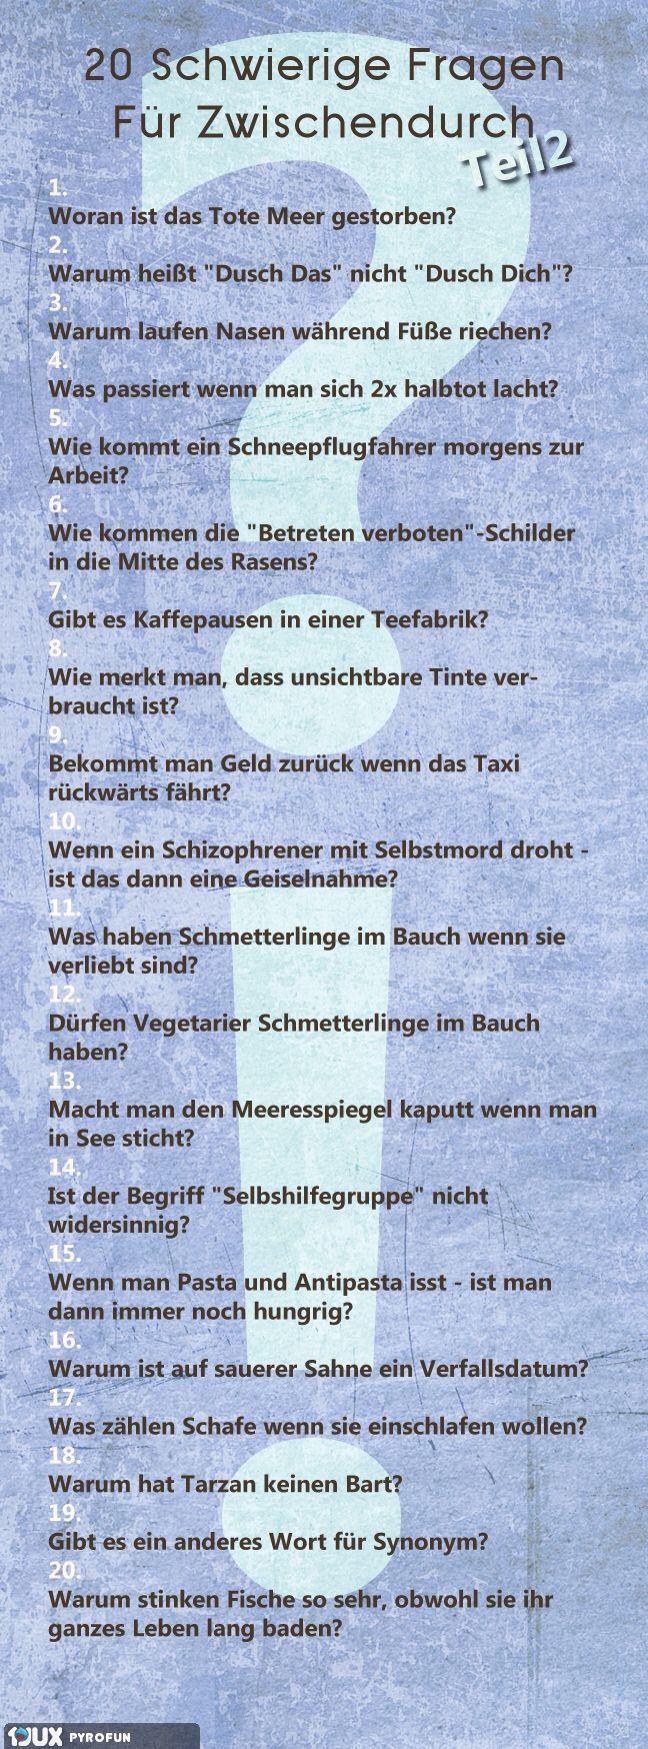 109 best Deutsch images on Pinterest | German language, Learn german ...